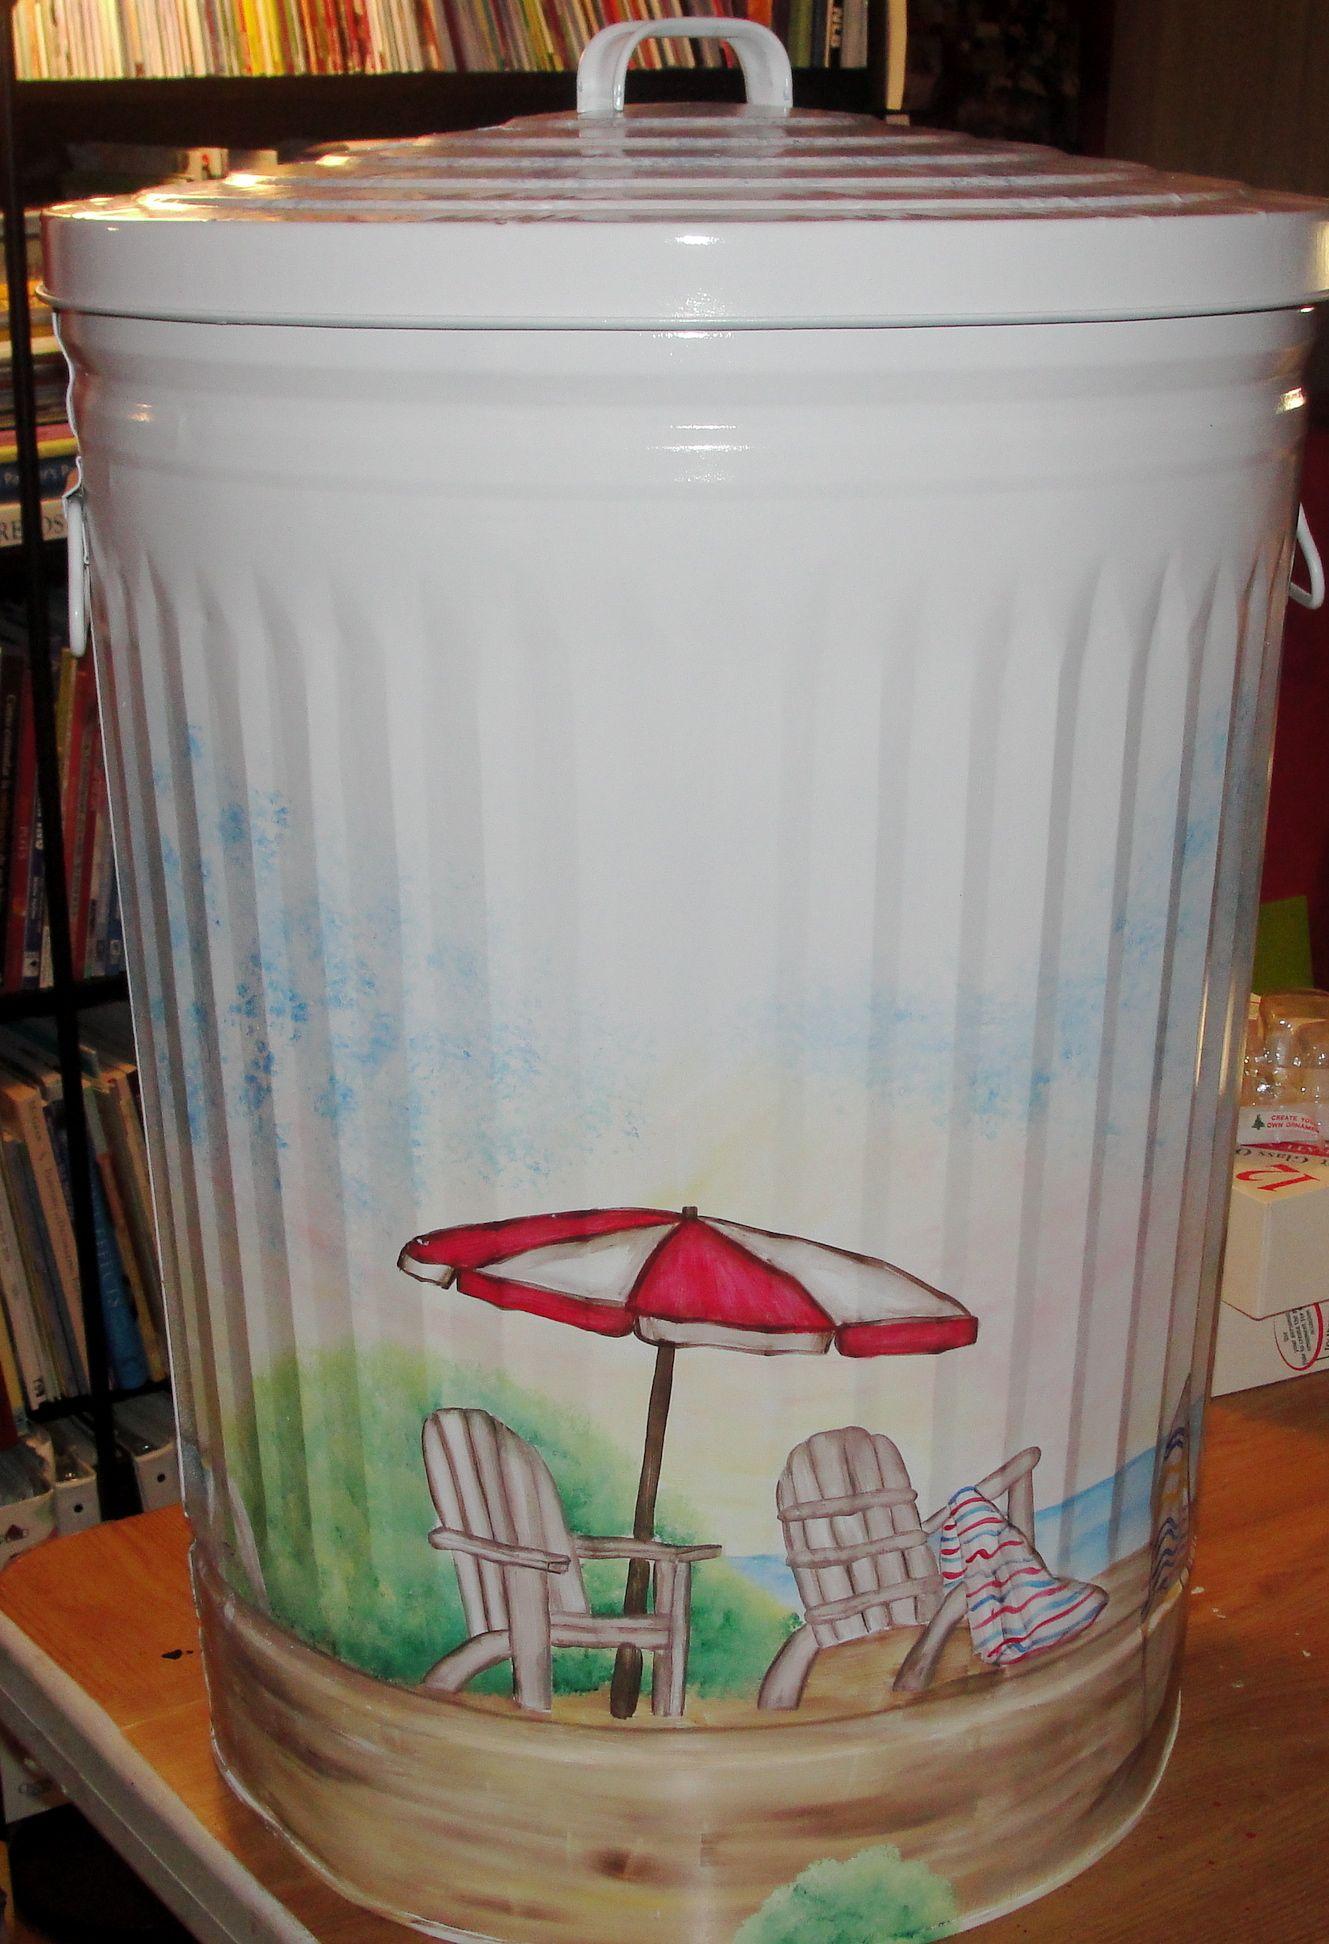 Painted Trash Cans Cool Decor Stuff Pinterest